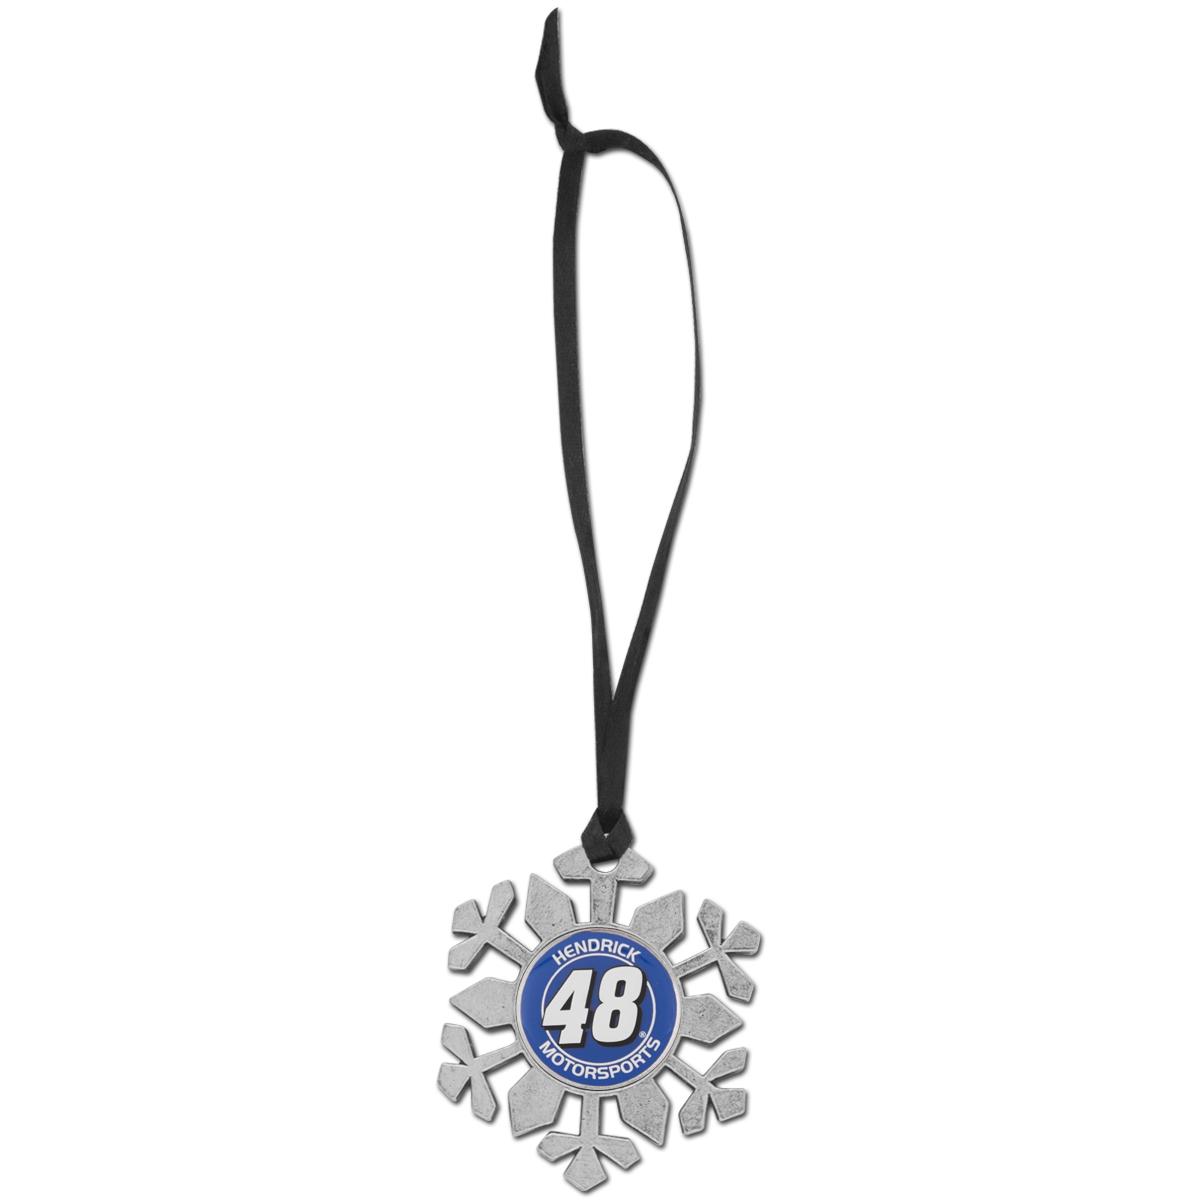 Hendrick MotorSports #48 Snowflake